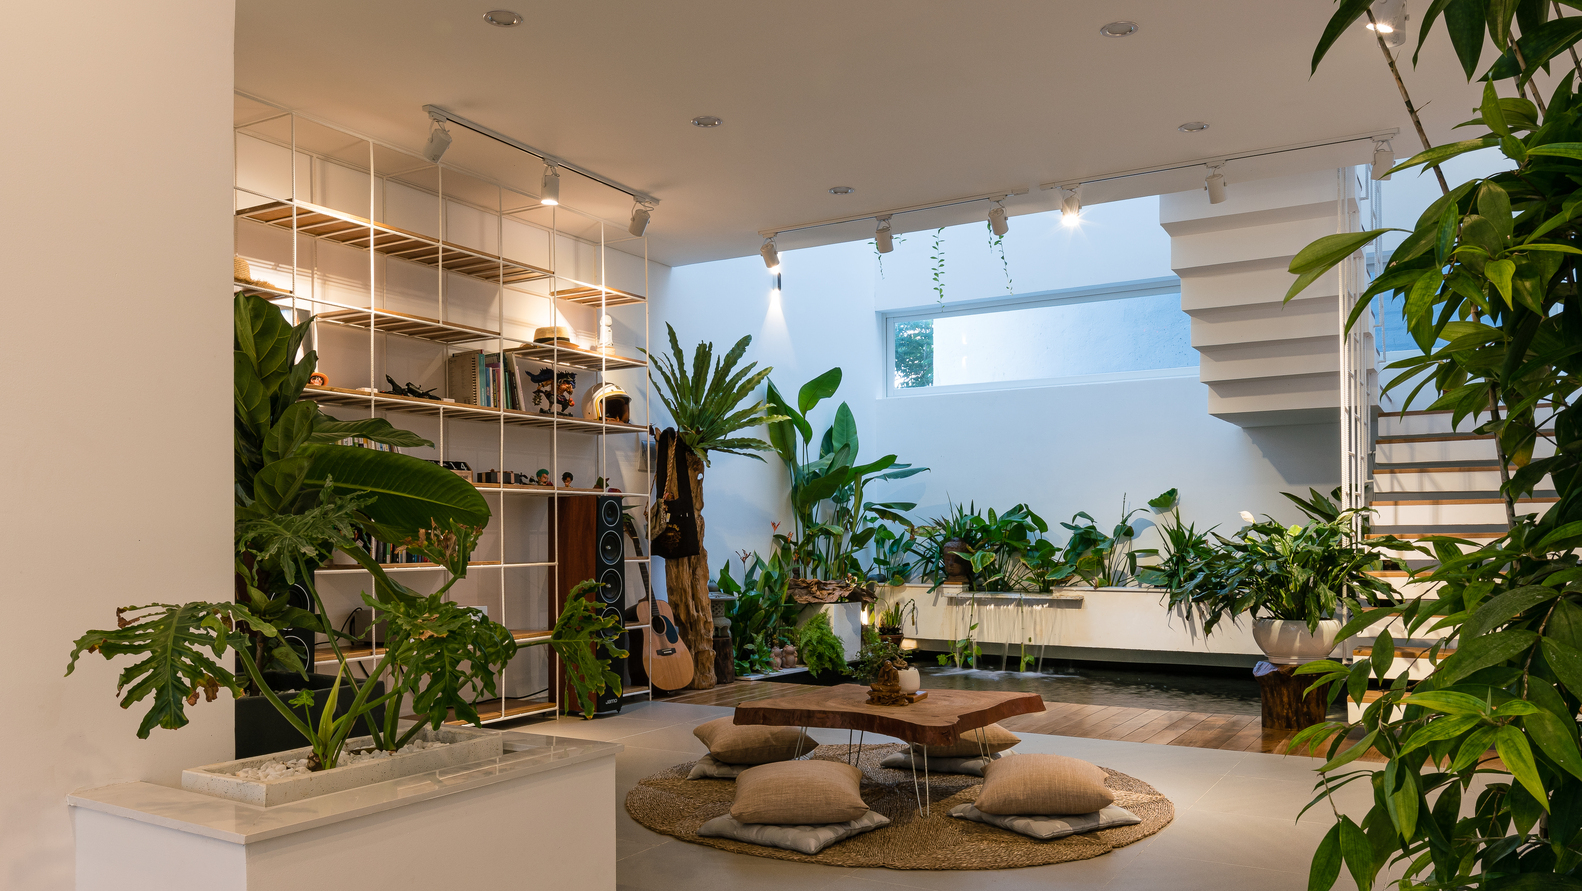 Tendencias en Diseño de Interiores 2020: Biofilia, Chubby y Fluidez,Q House / Q concept © Quang Dam